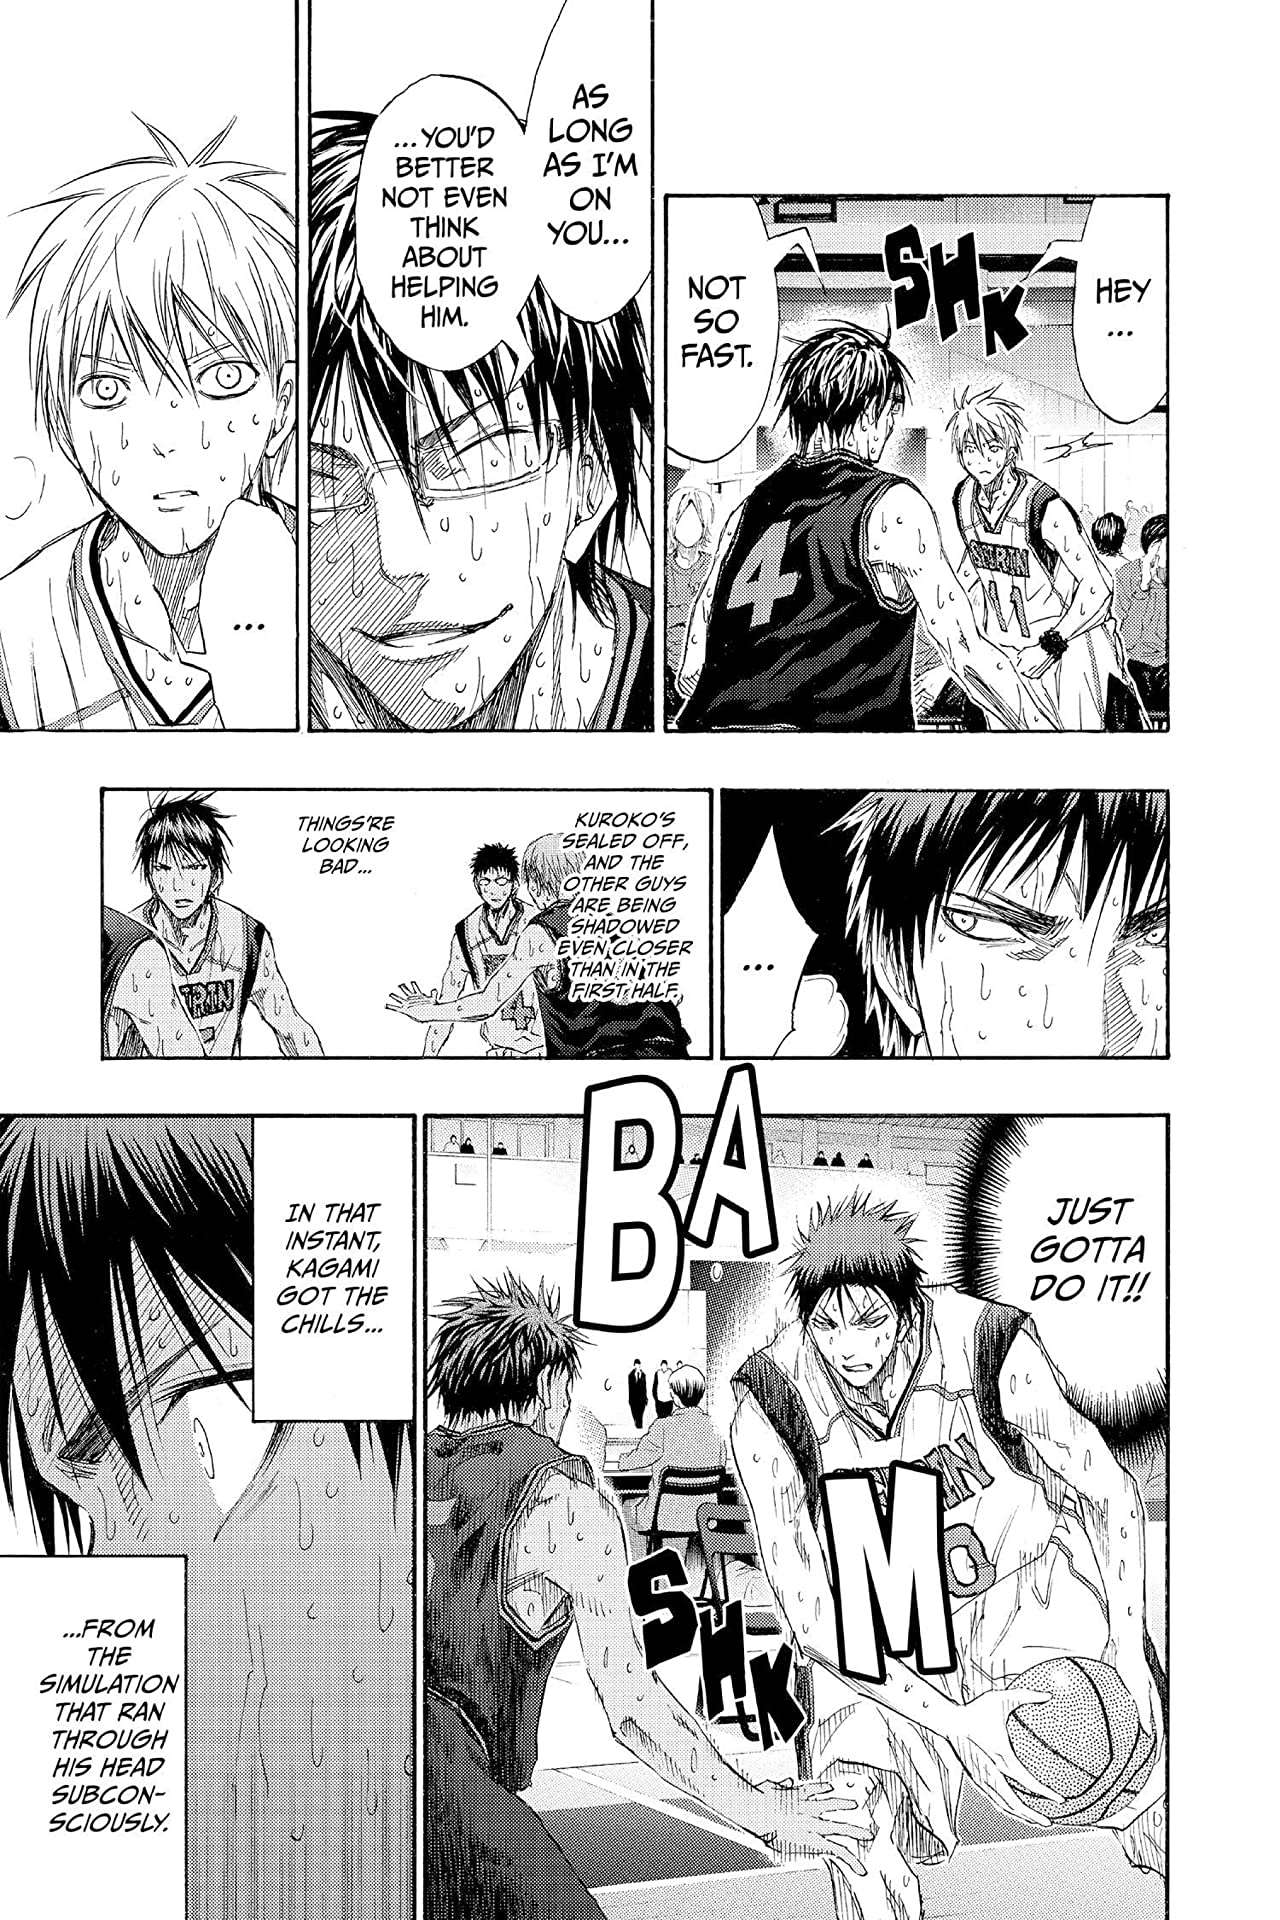 Kuroko's Basketball Vol. 8